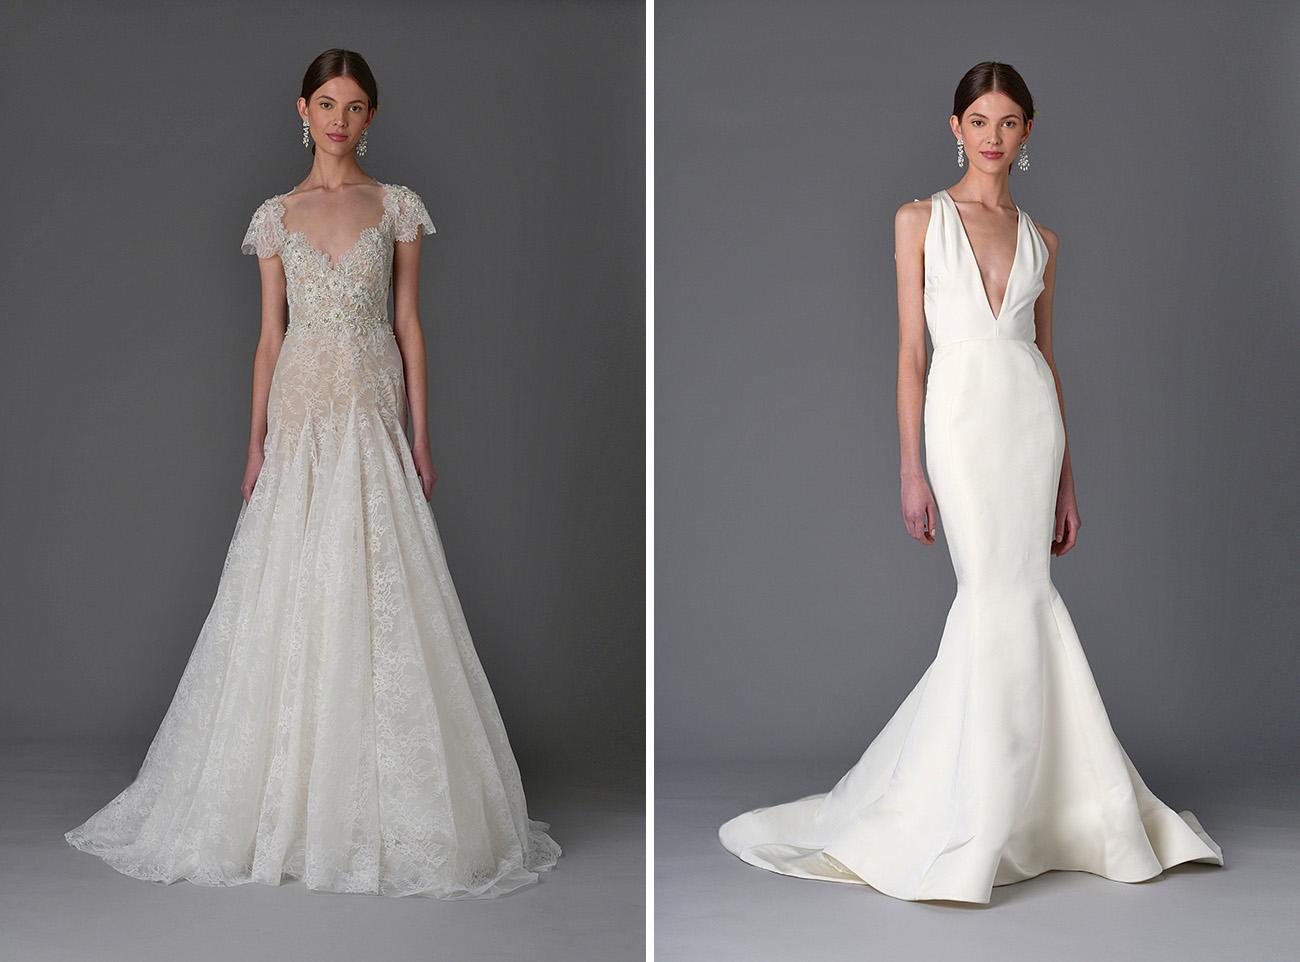 Marchesa Bridal Spring 2017 Dresses